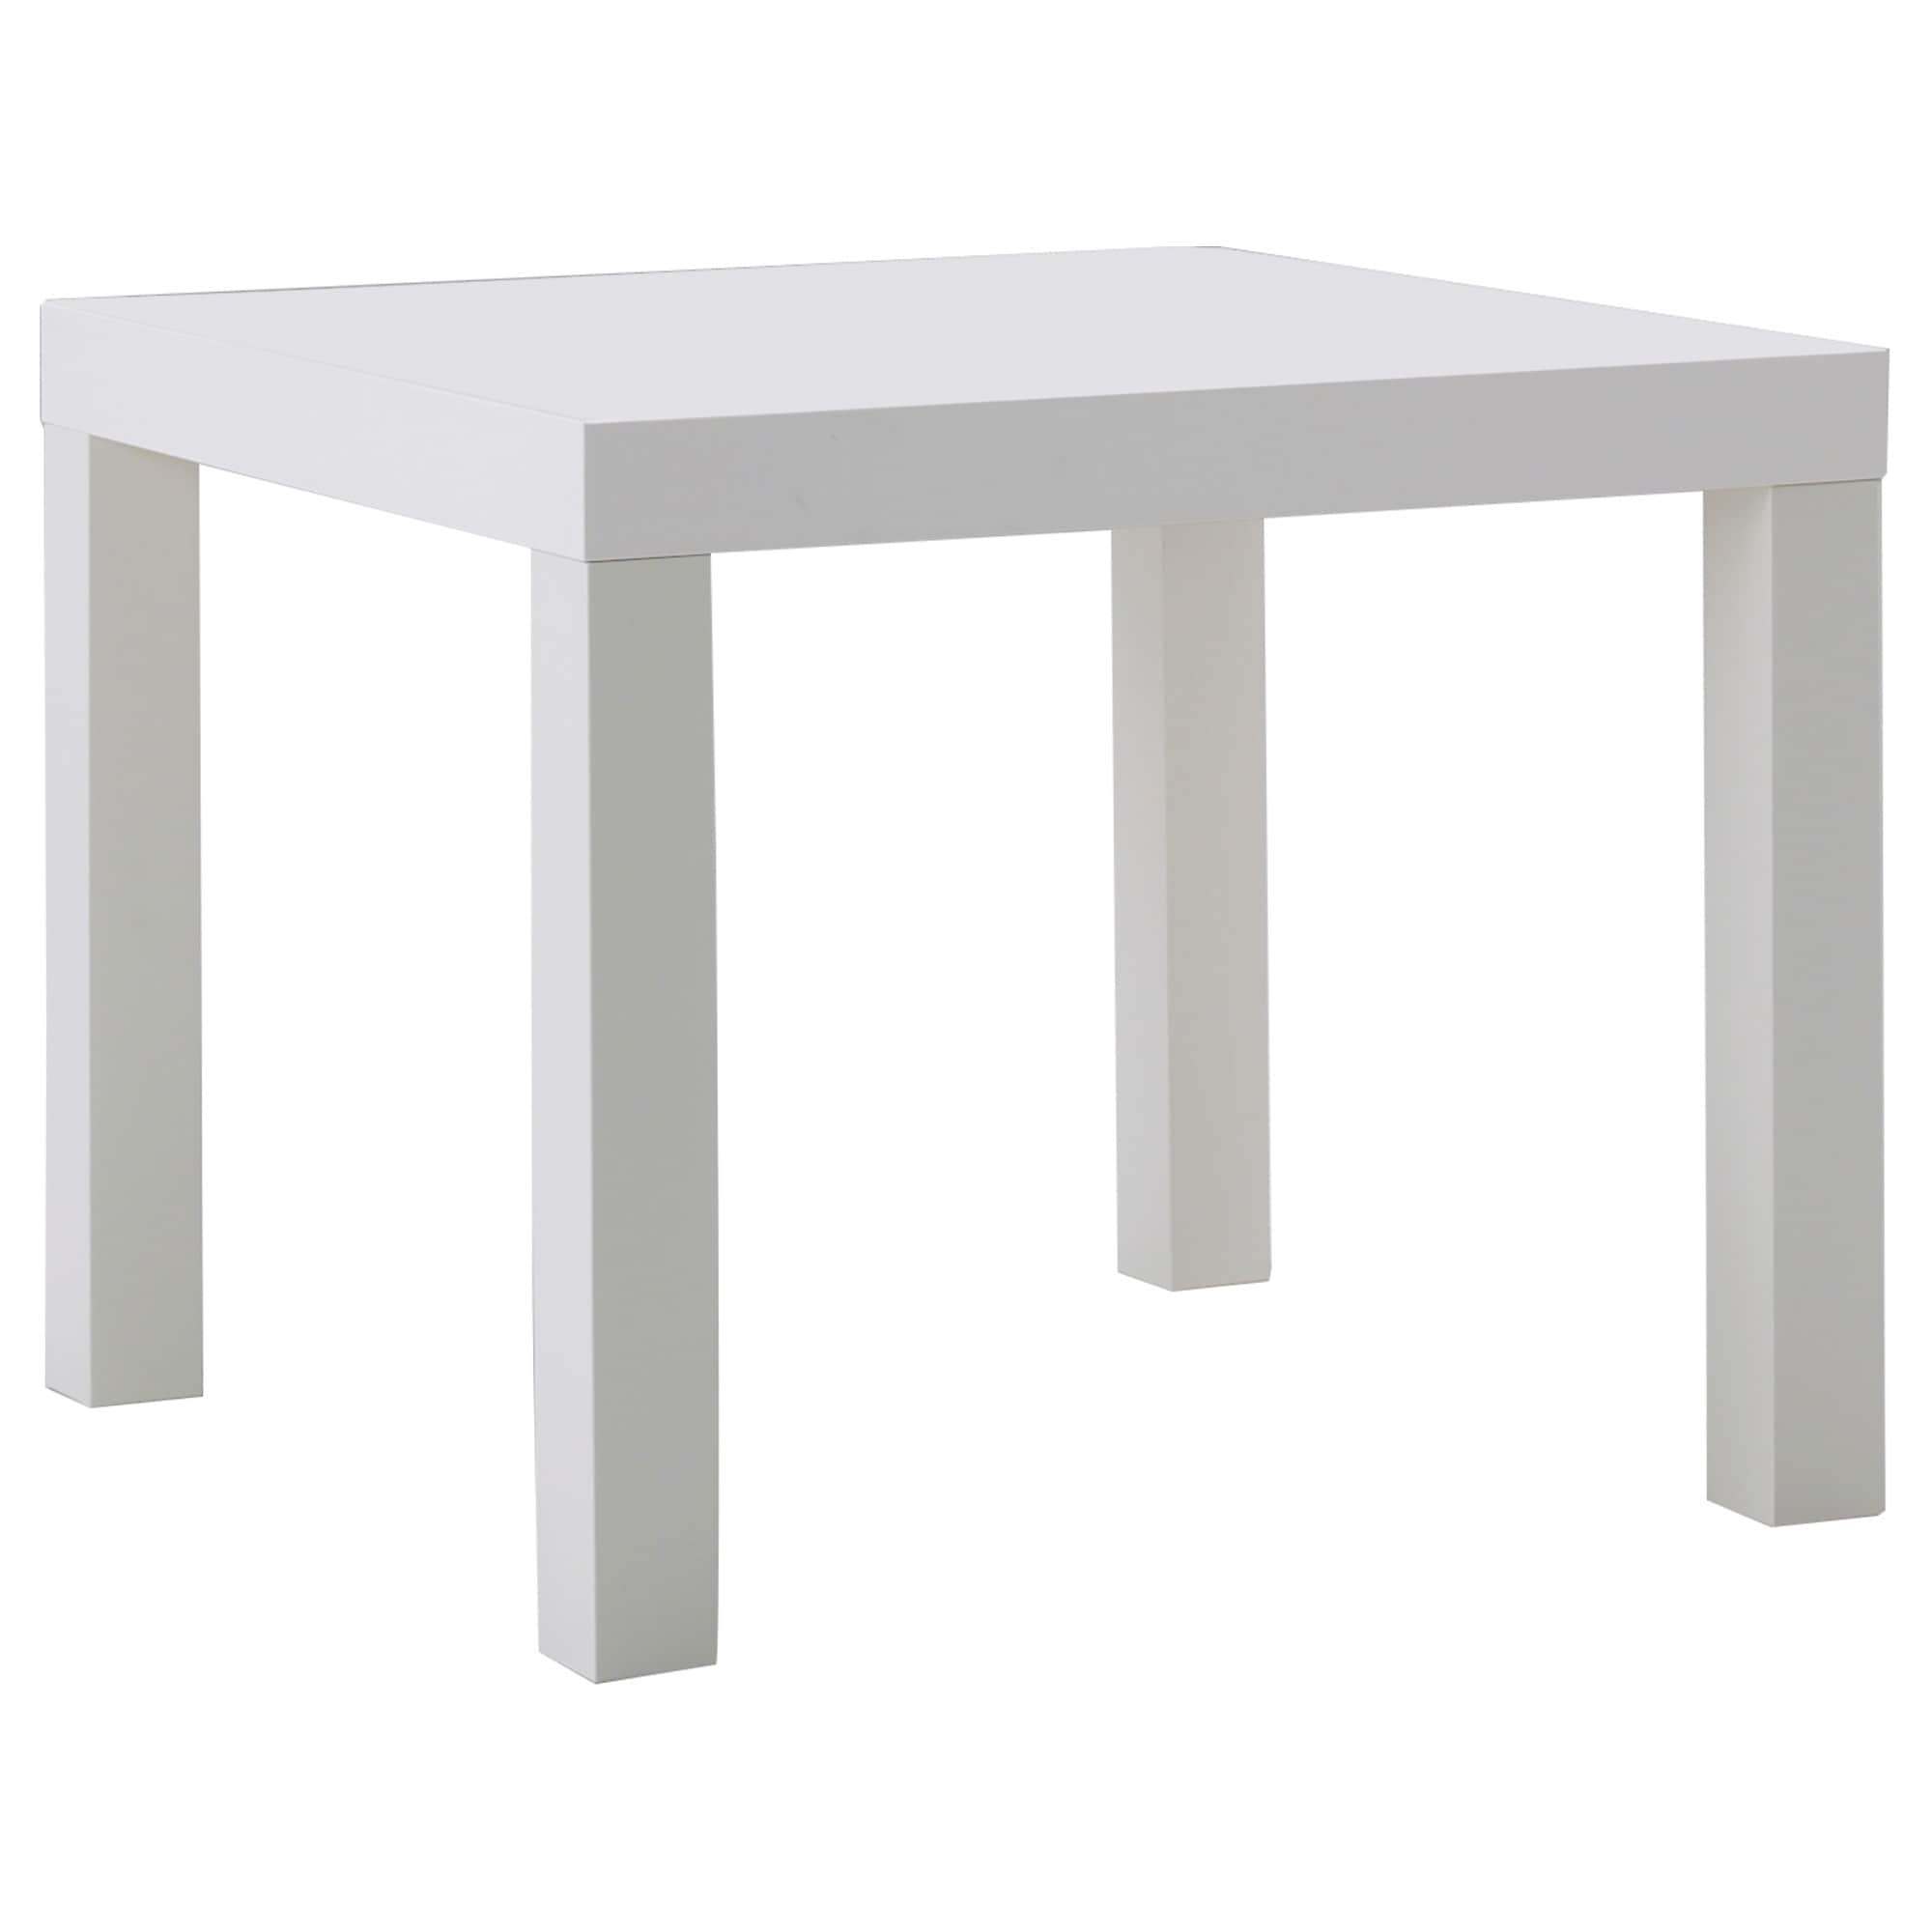 Mesas De Cocina Plegables Ikea 4pde Mesas De Centro Y Mesas ...